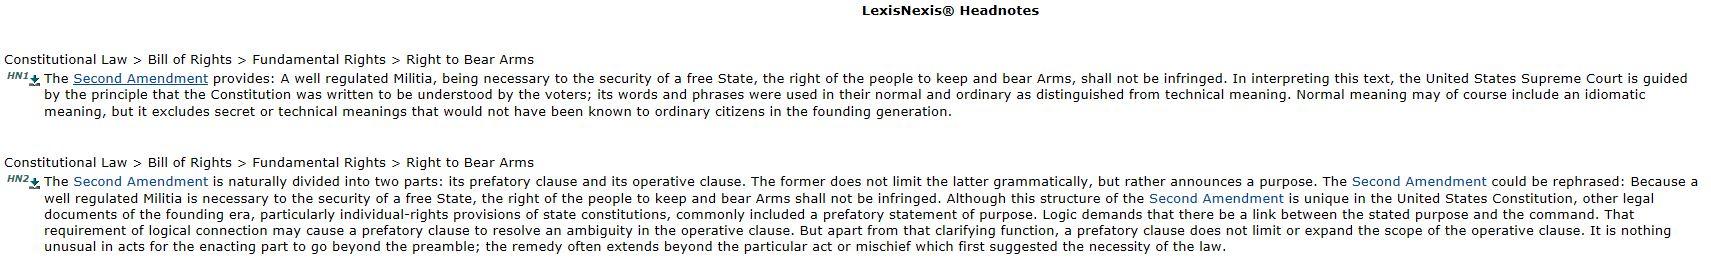 lexisnexis psci 4210 constitutional law civil rights and civil